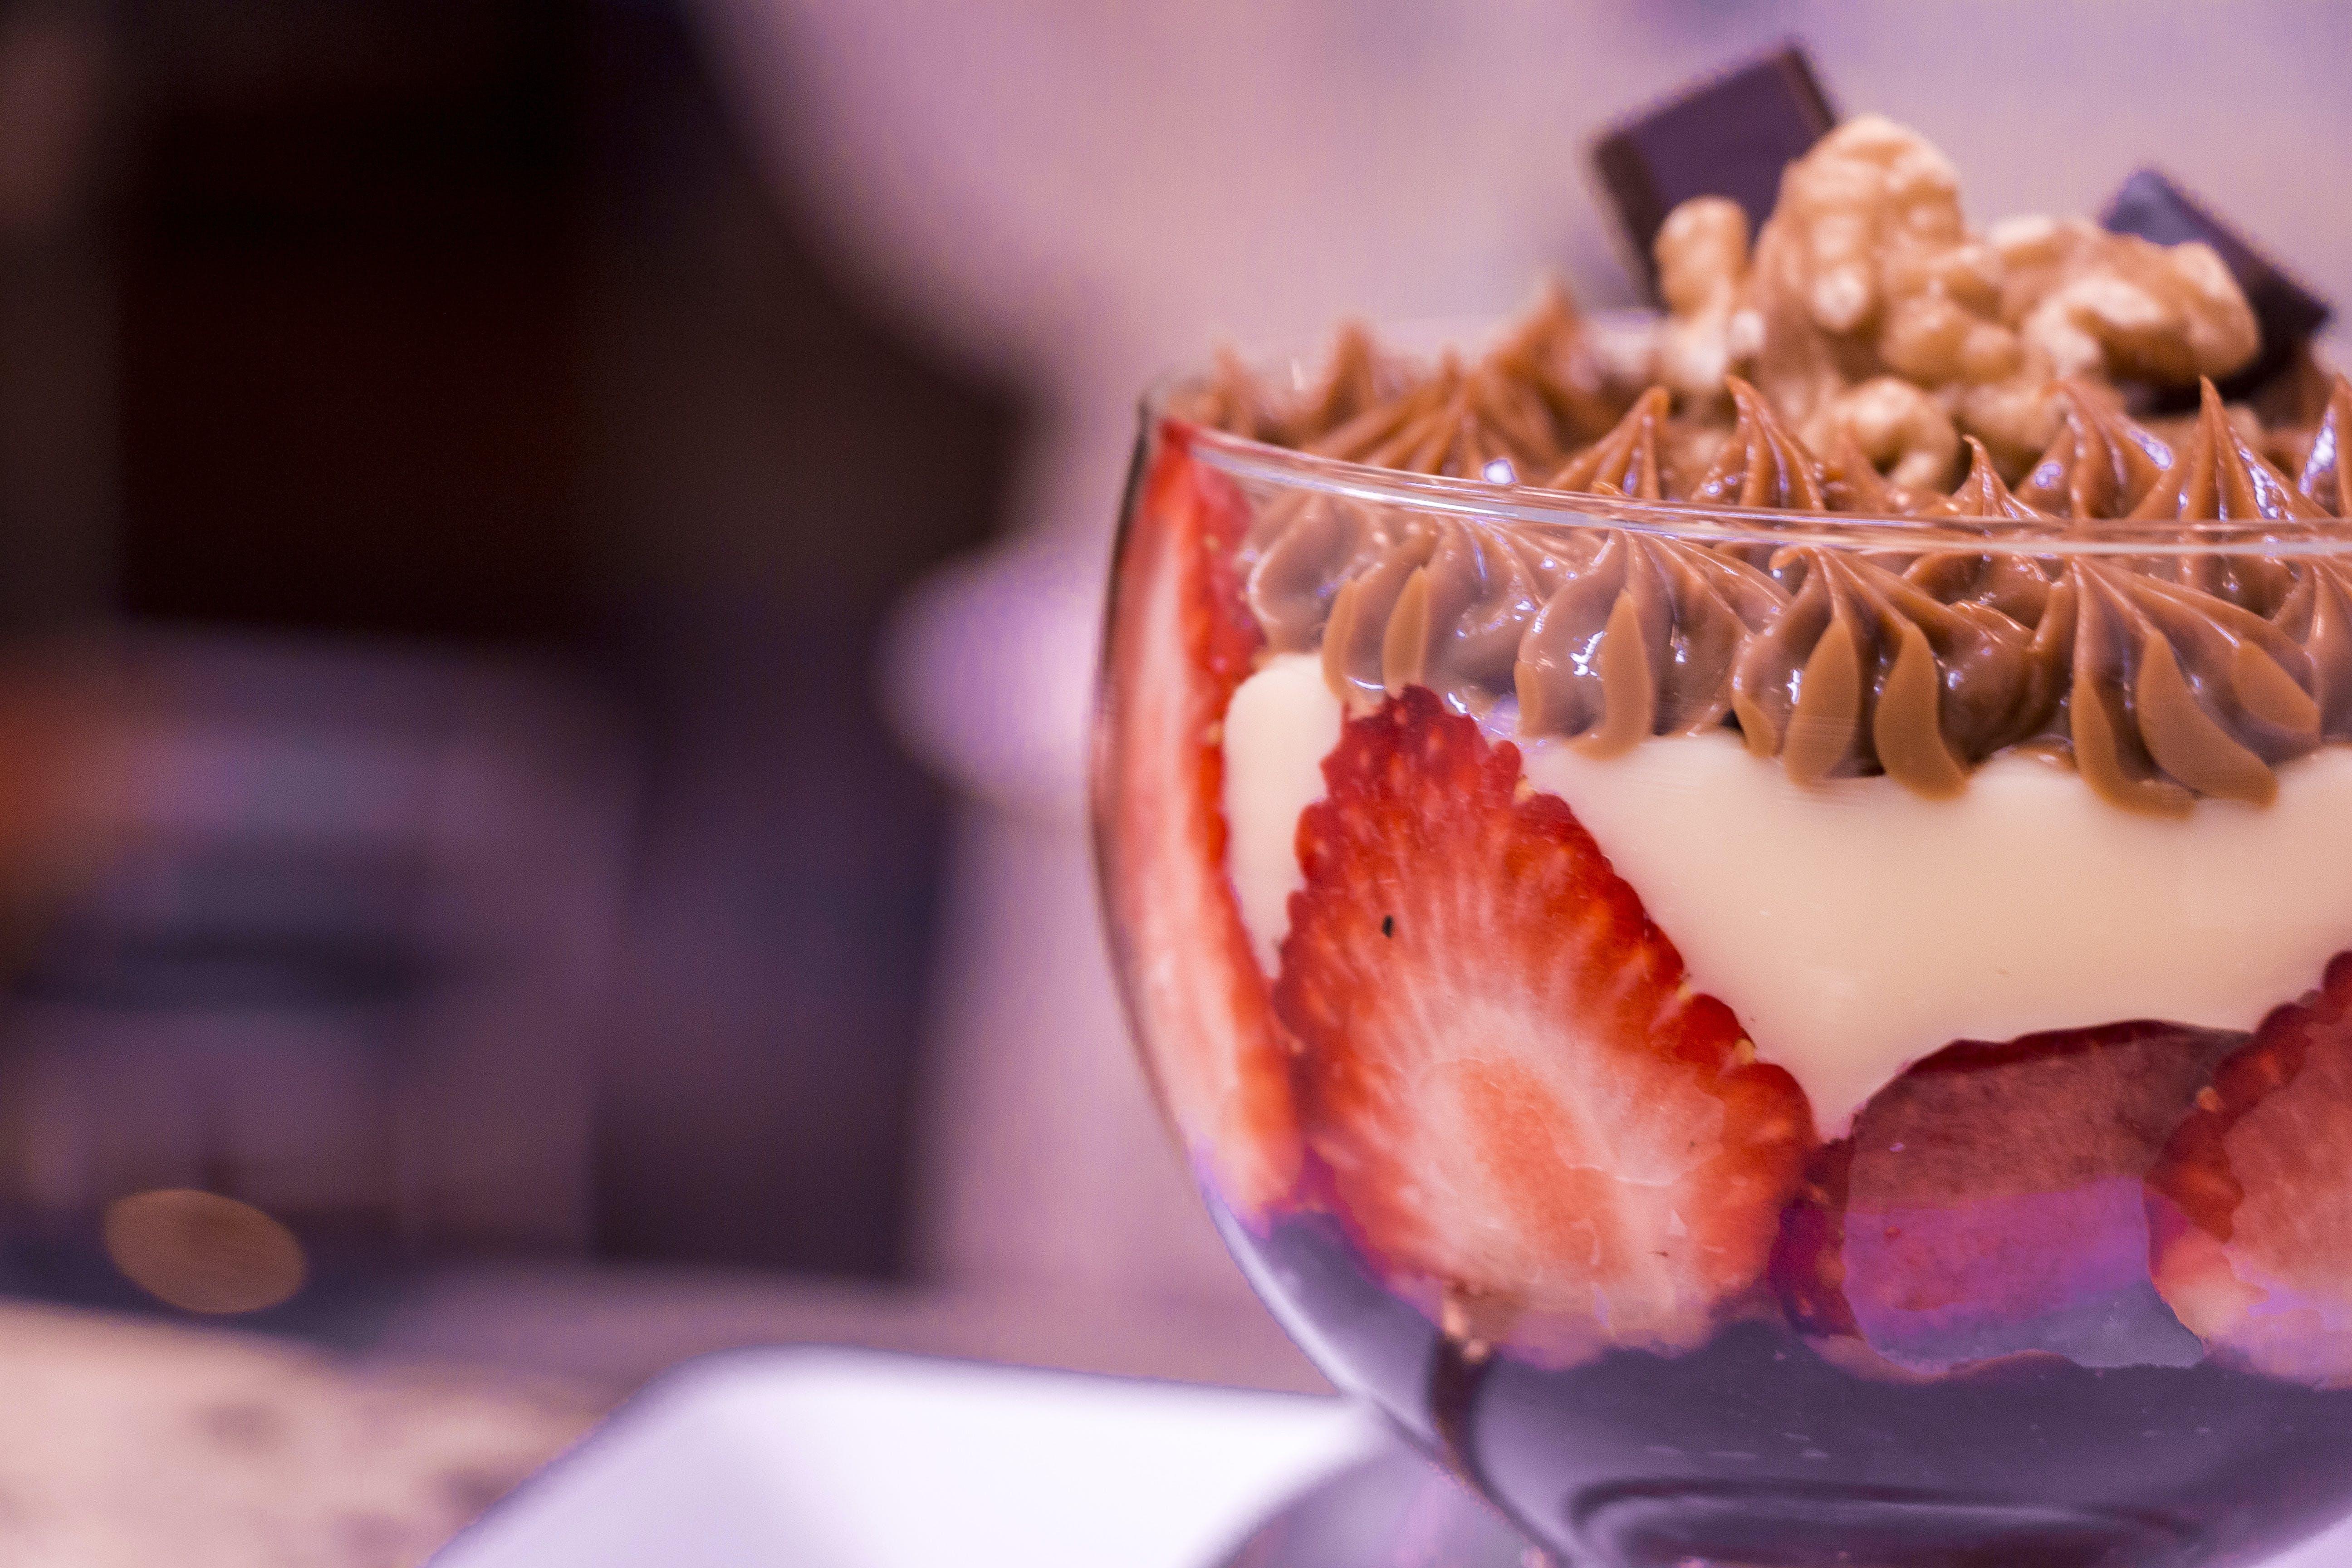 Kostenloses Stock Foto zu erdbeere, erdbeeren, köstlich, schokolade